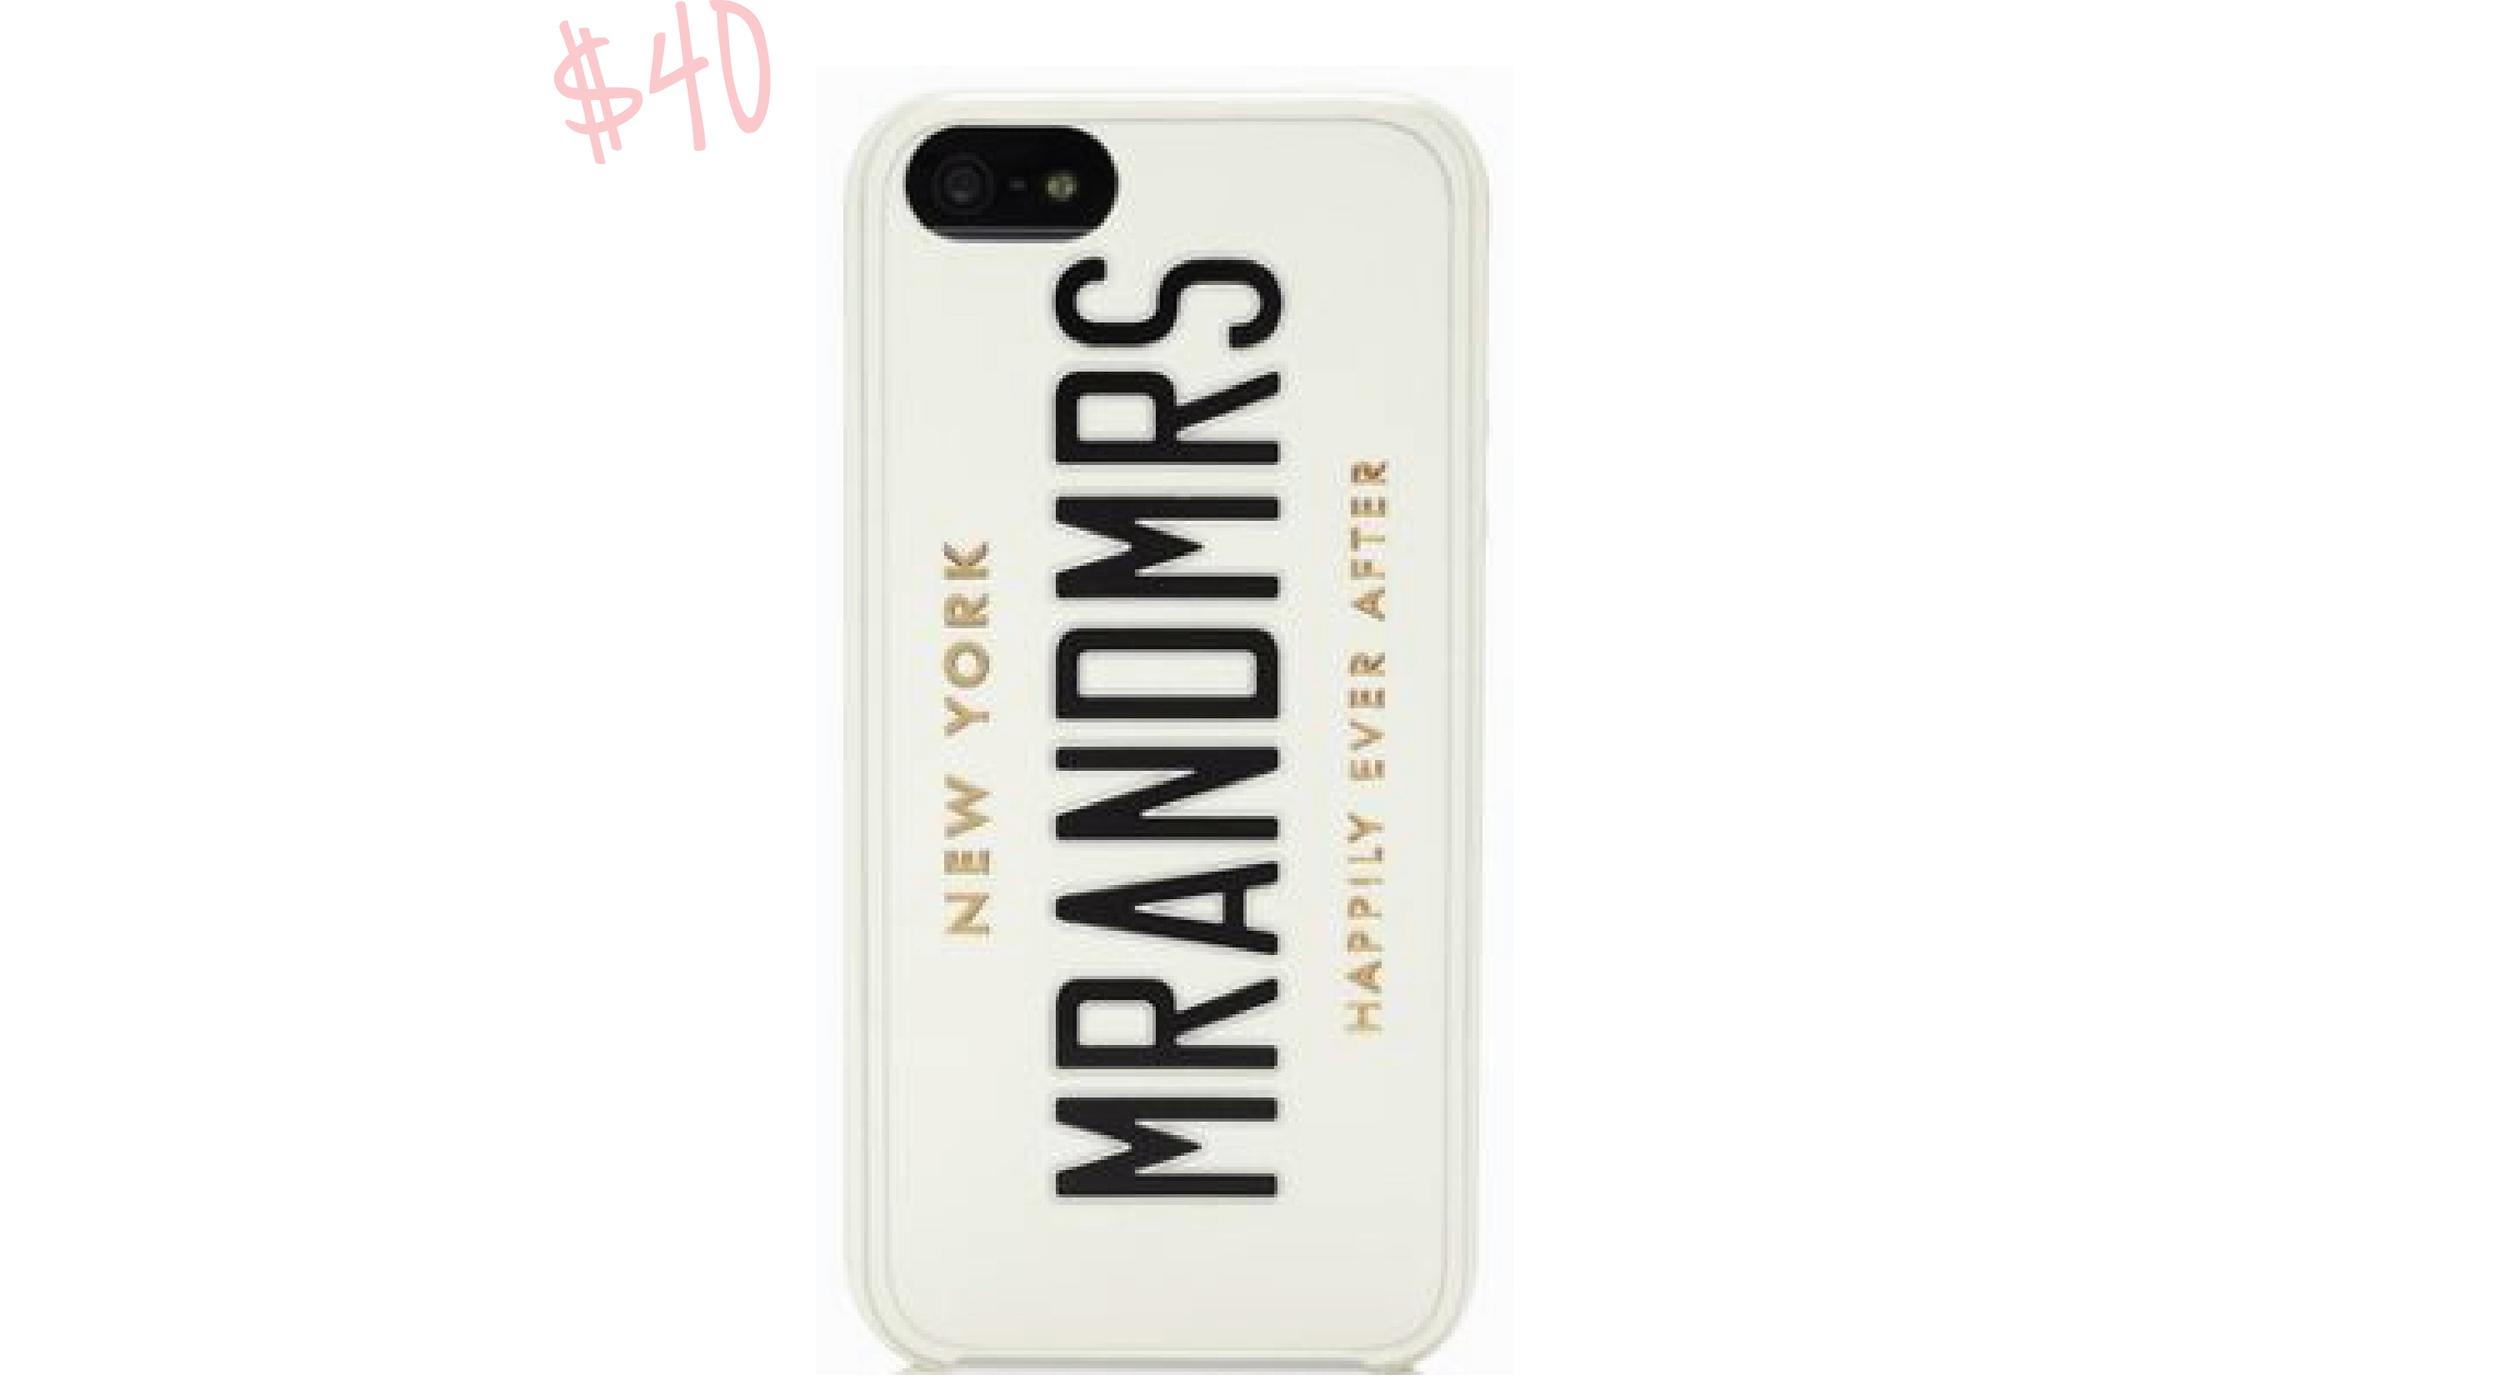 Newlywed iPhone 5 Case